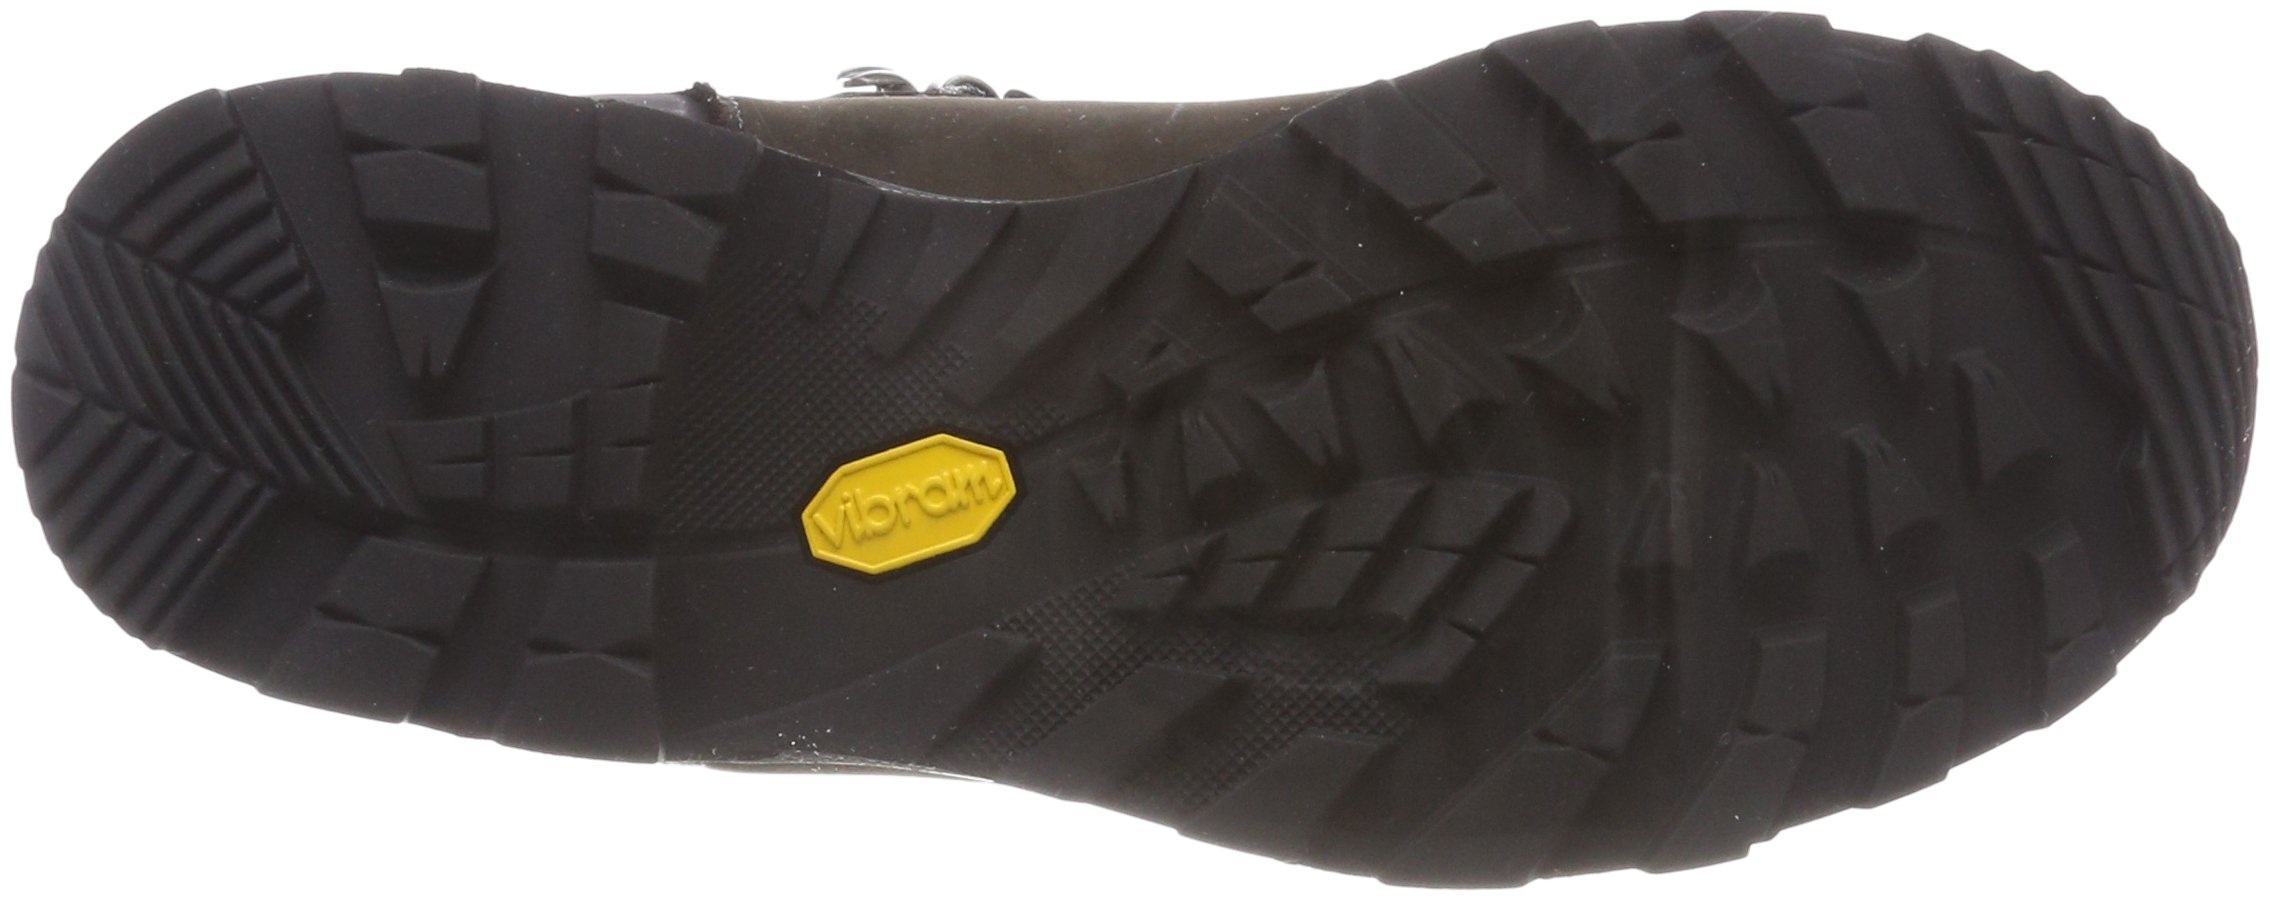 71DqZ3vQY0L - Lowa Women's Mauria GTX Ws High Rise Hiking Boots